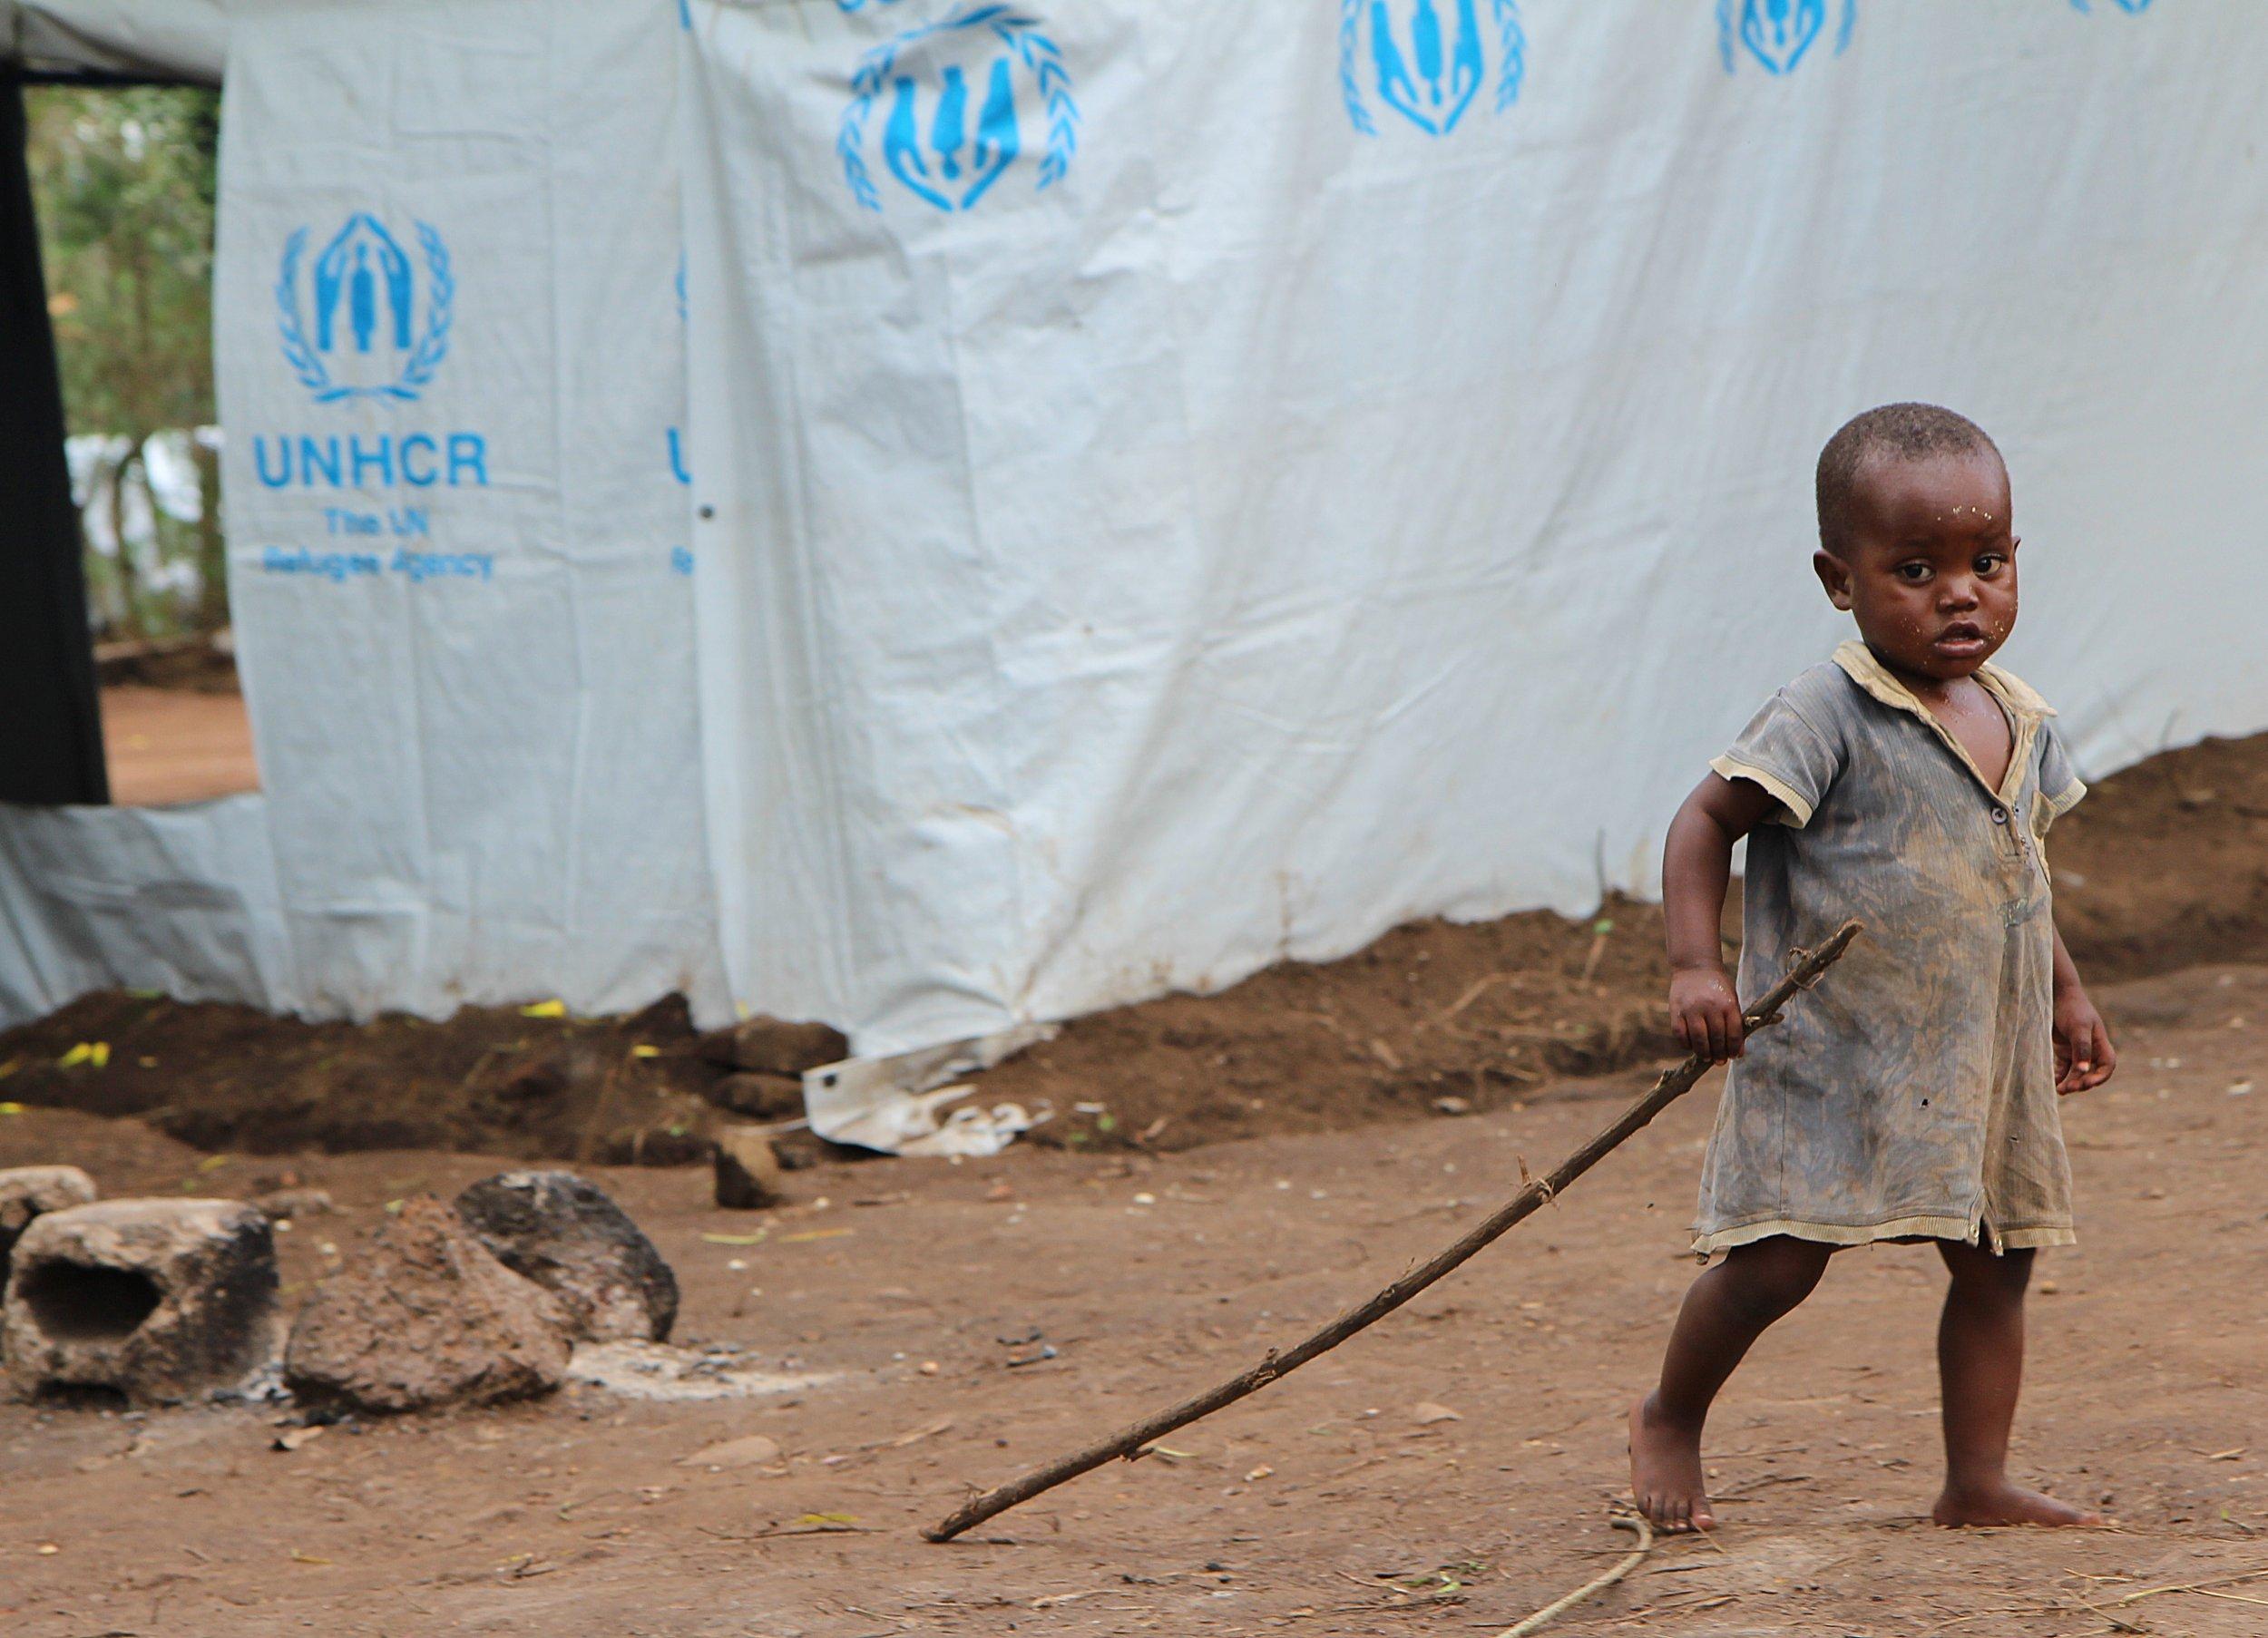 A Burundian refugee plays in a Rwandan refugee camp.